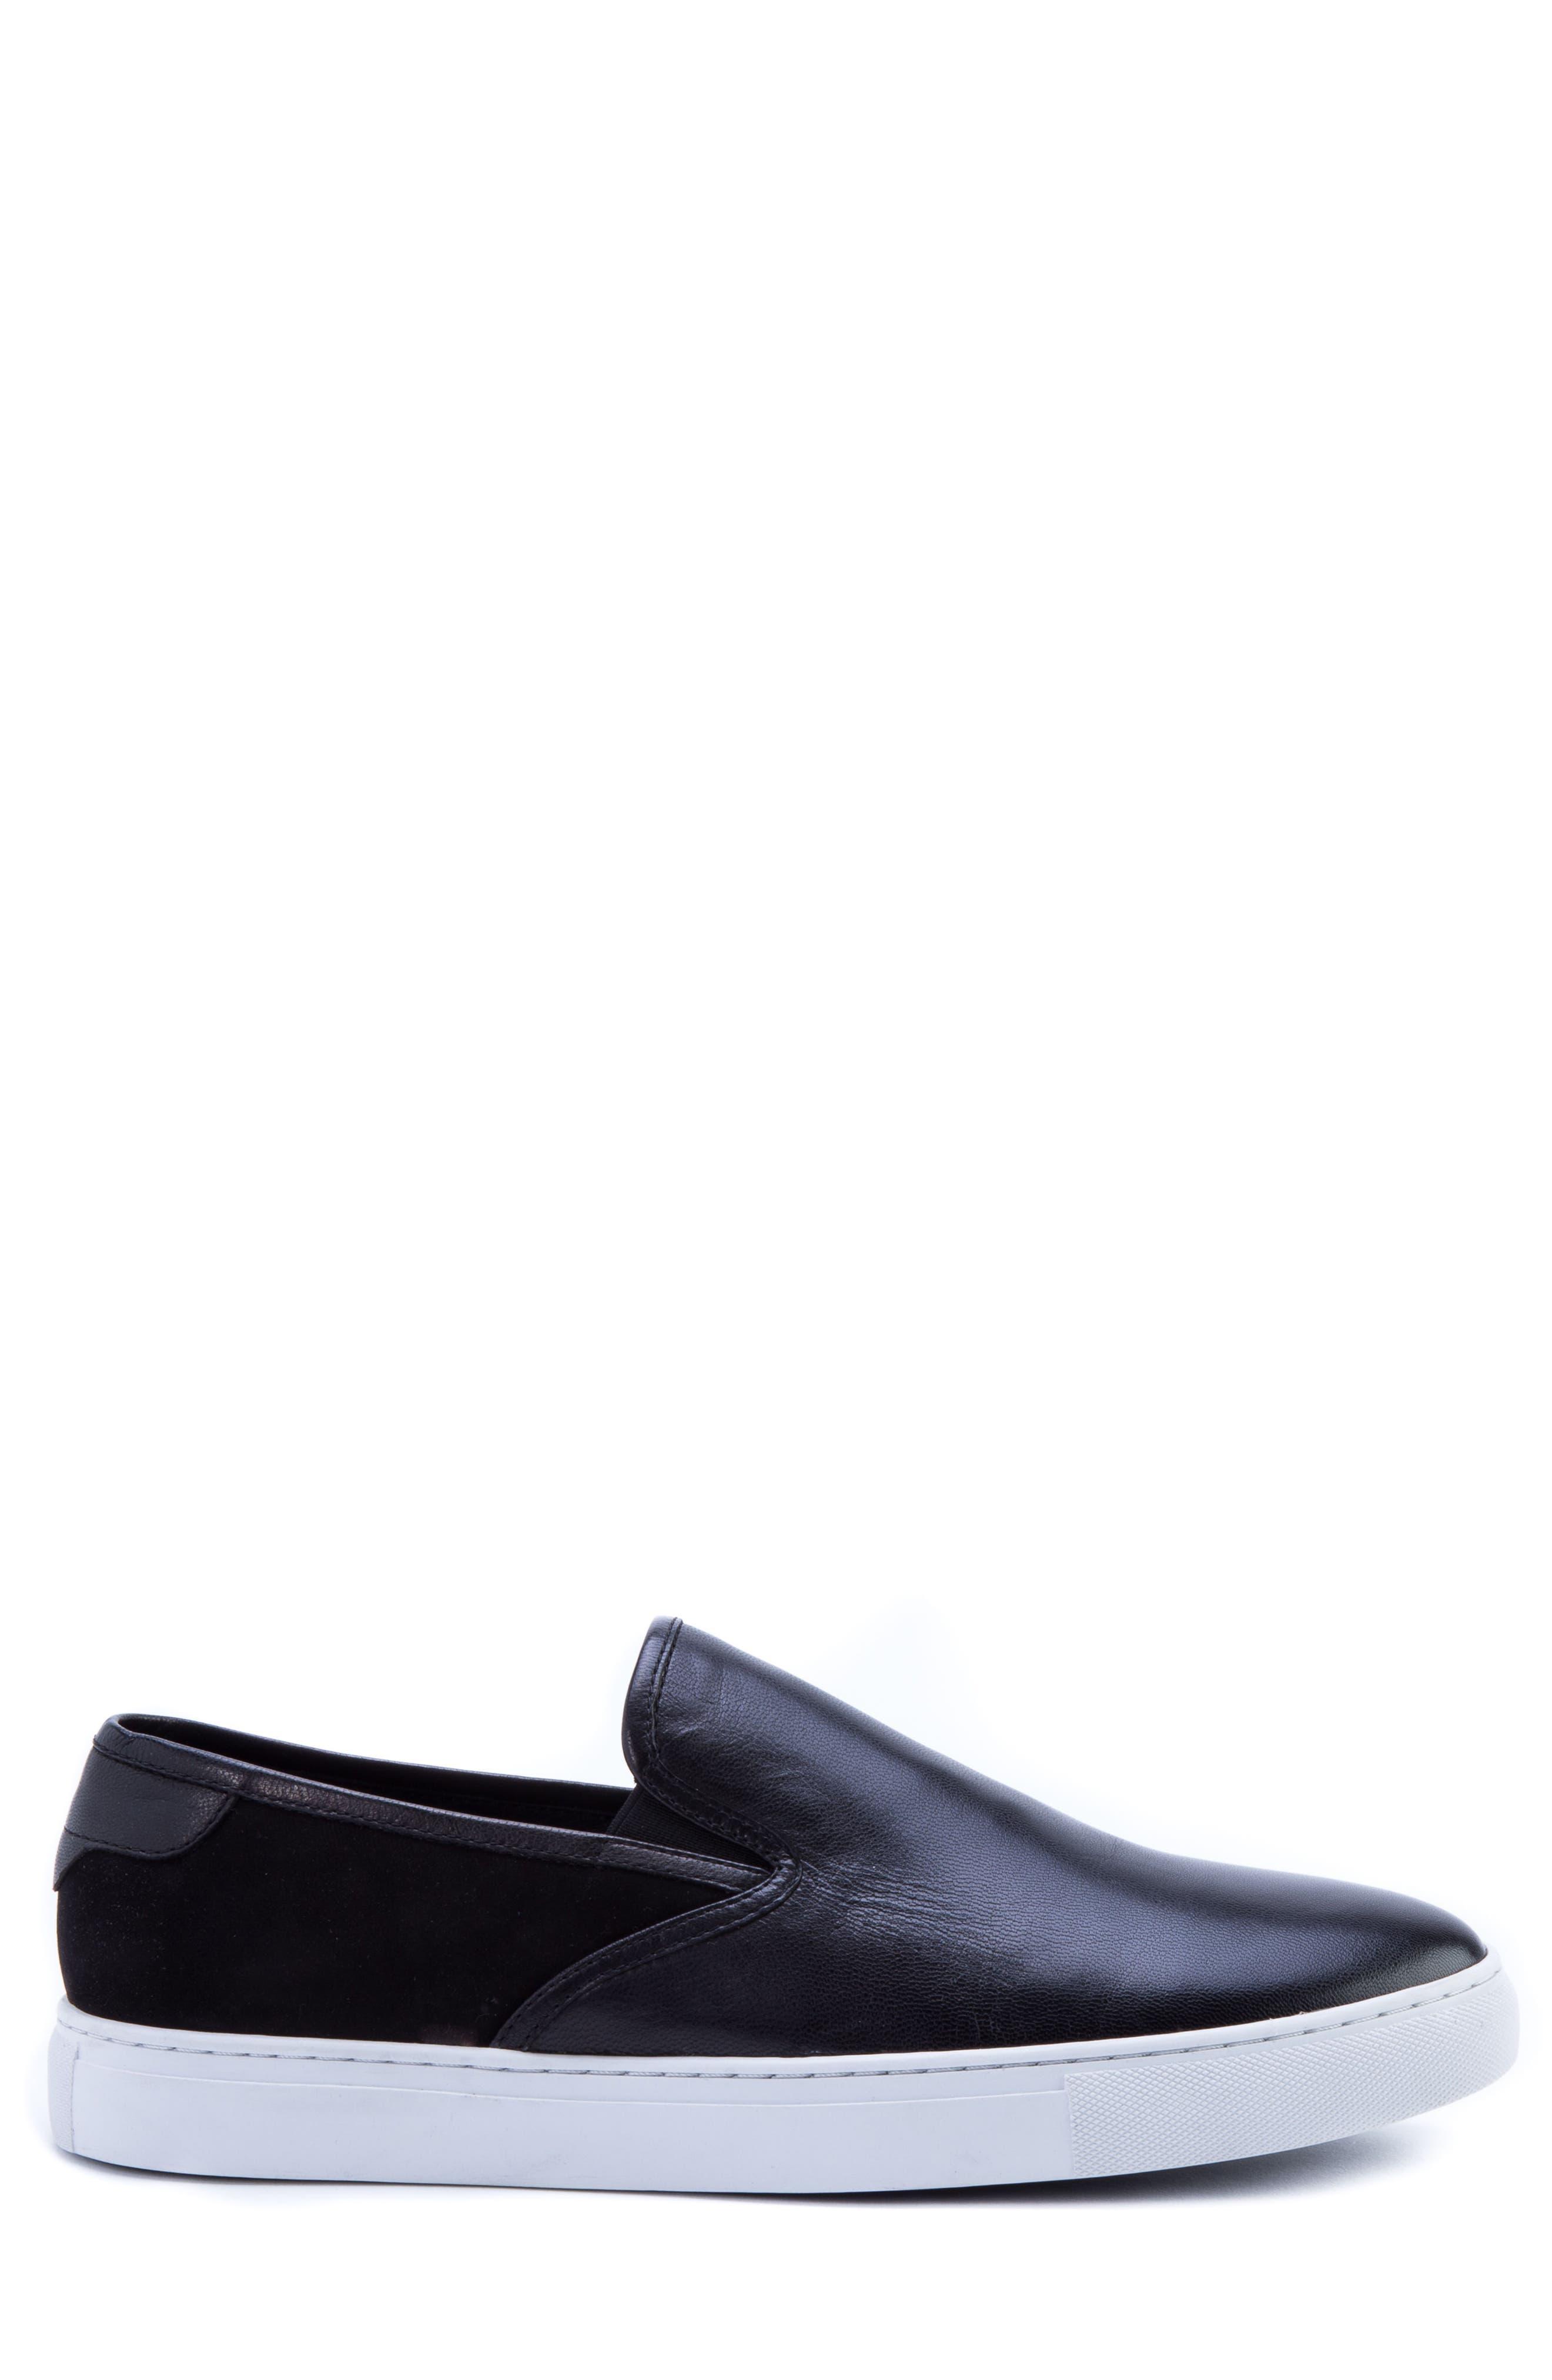 Duchamps Slip-On Sneaker,                             Alternate thumbnail 3, color,                             Black Leather/ Suede